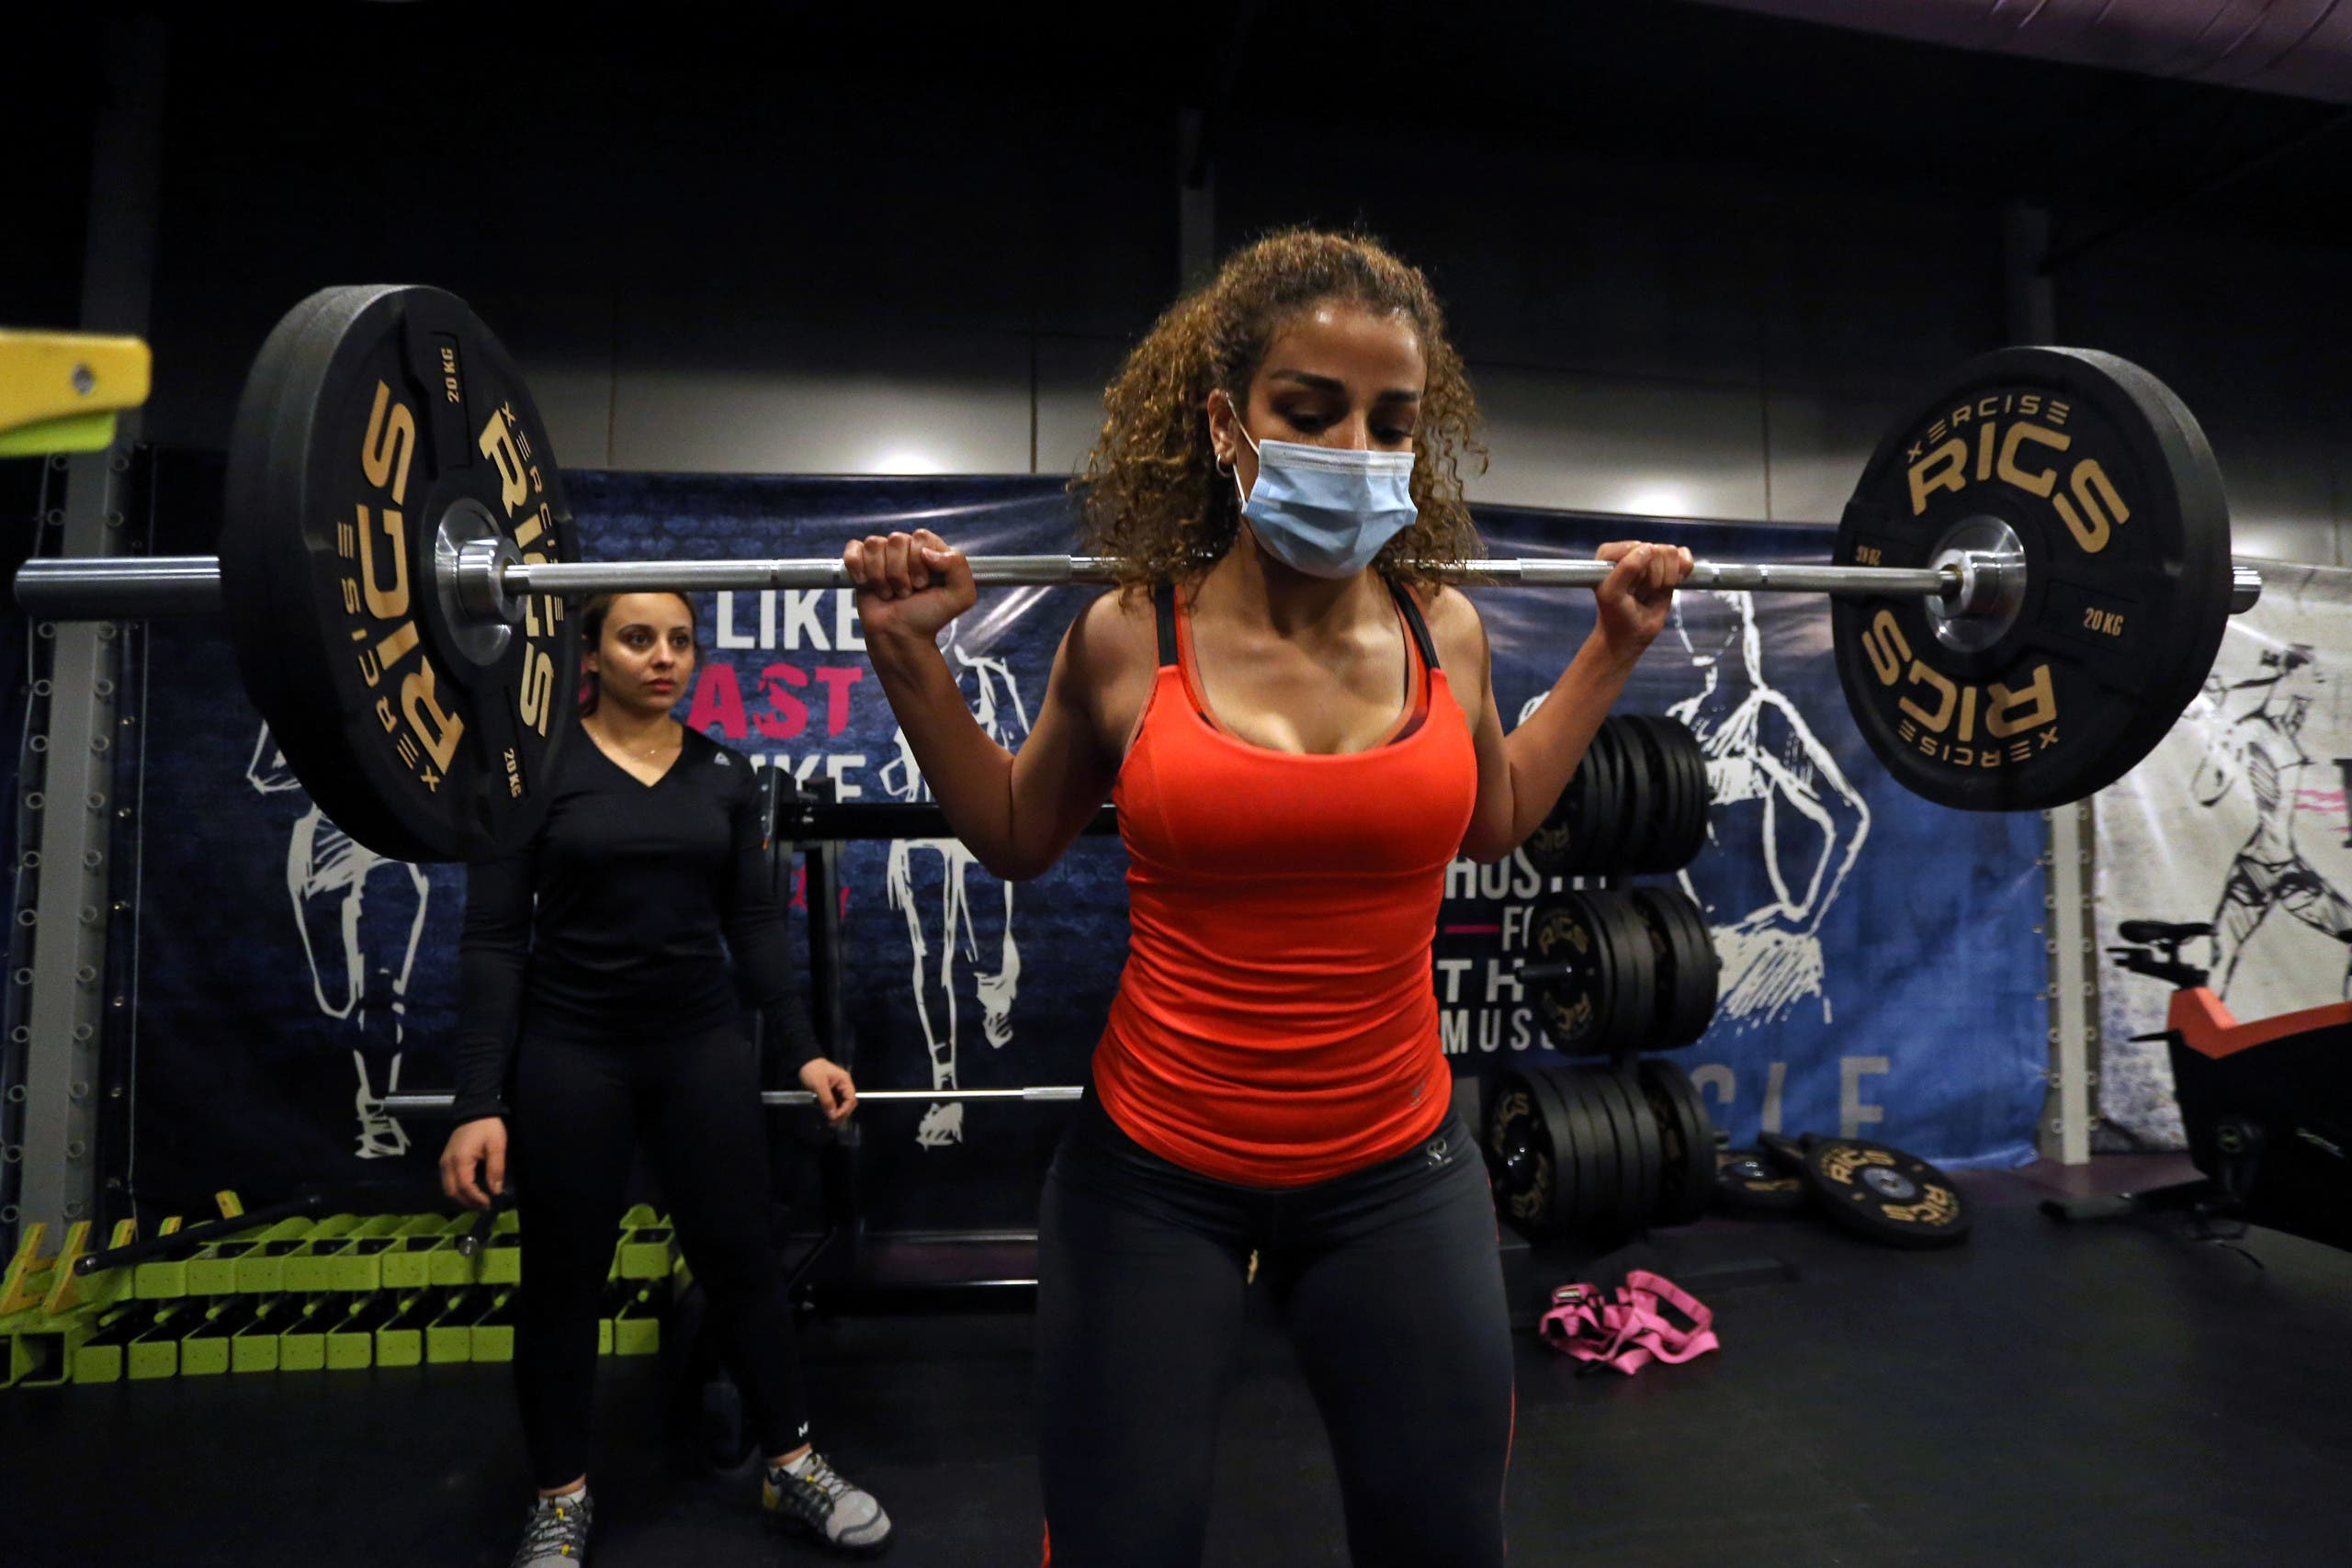 A Saudi woman Balqees, works out at a gym, amid the spread of the coronavirus disease (COVID-19), in Riyadh, Saudi Arabia. (Reuters)